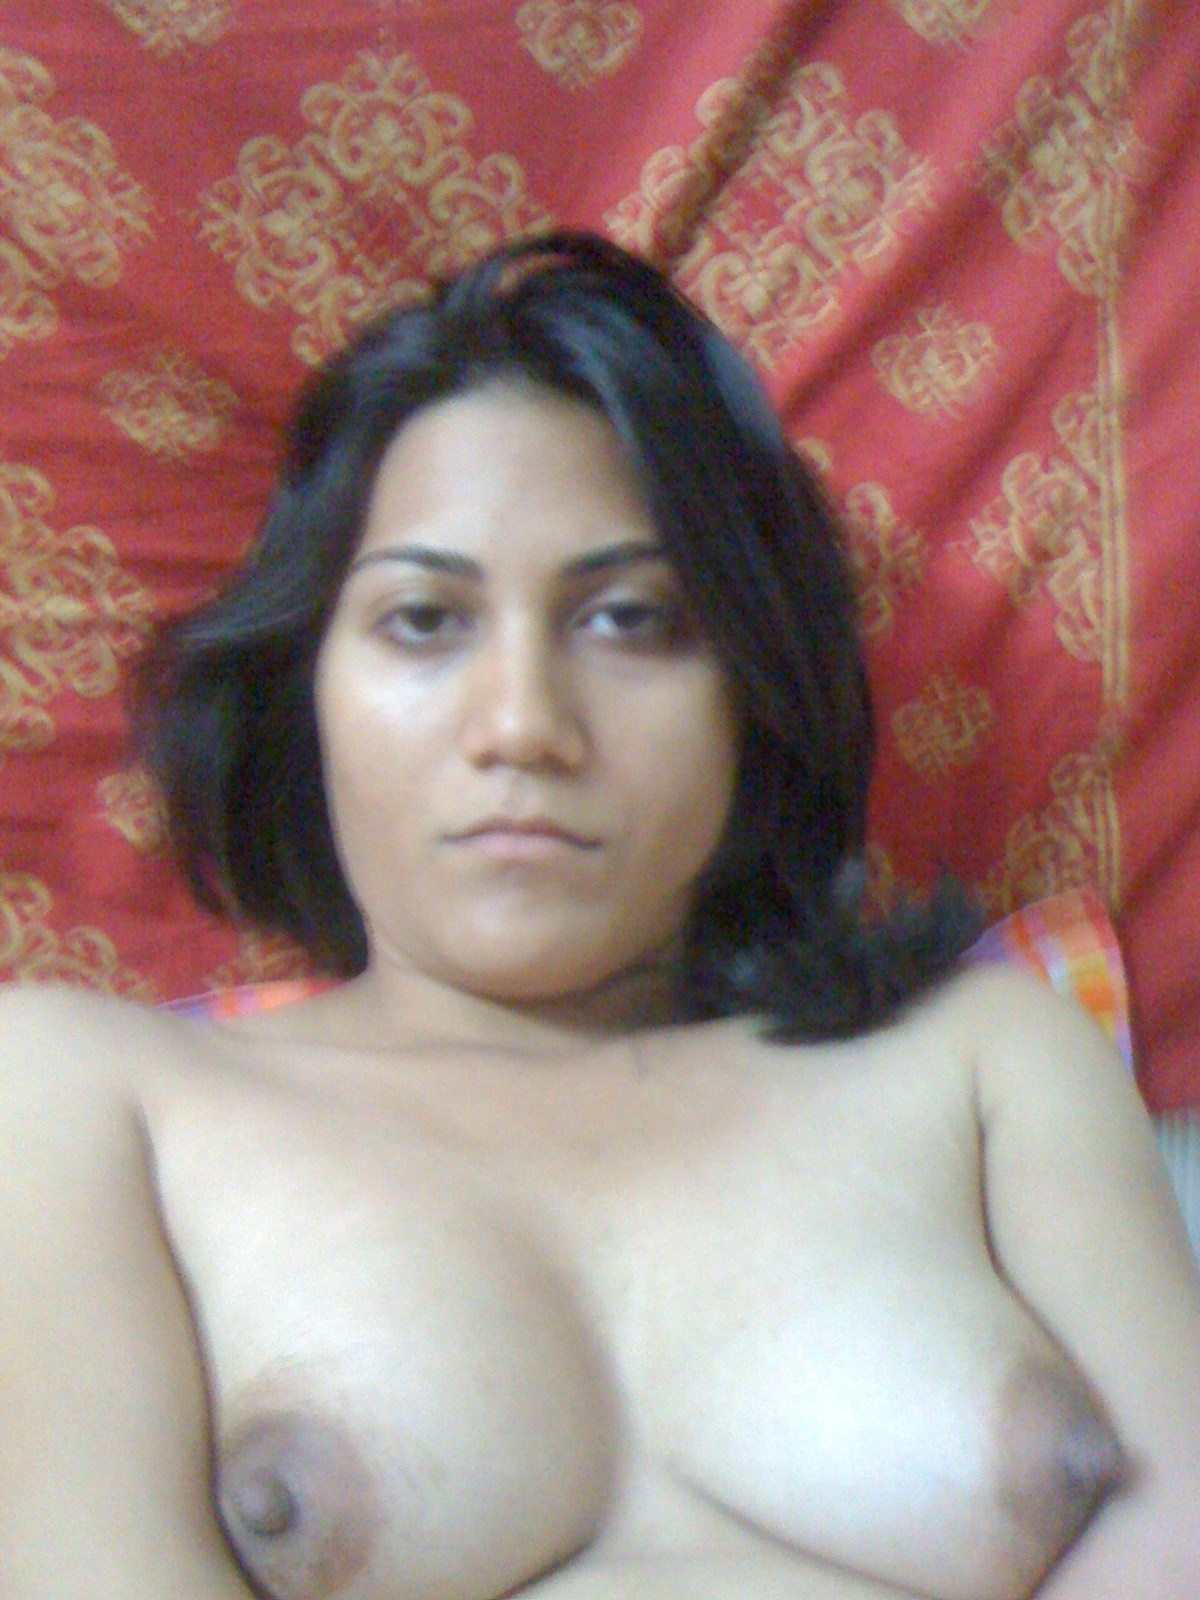 img80.imgspice.com pimpandhost.com -1 ' img80.imgspice.com young nude